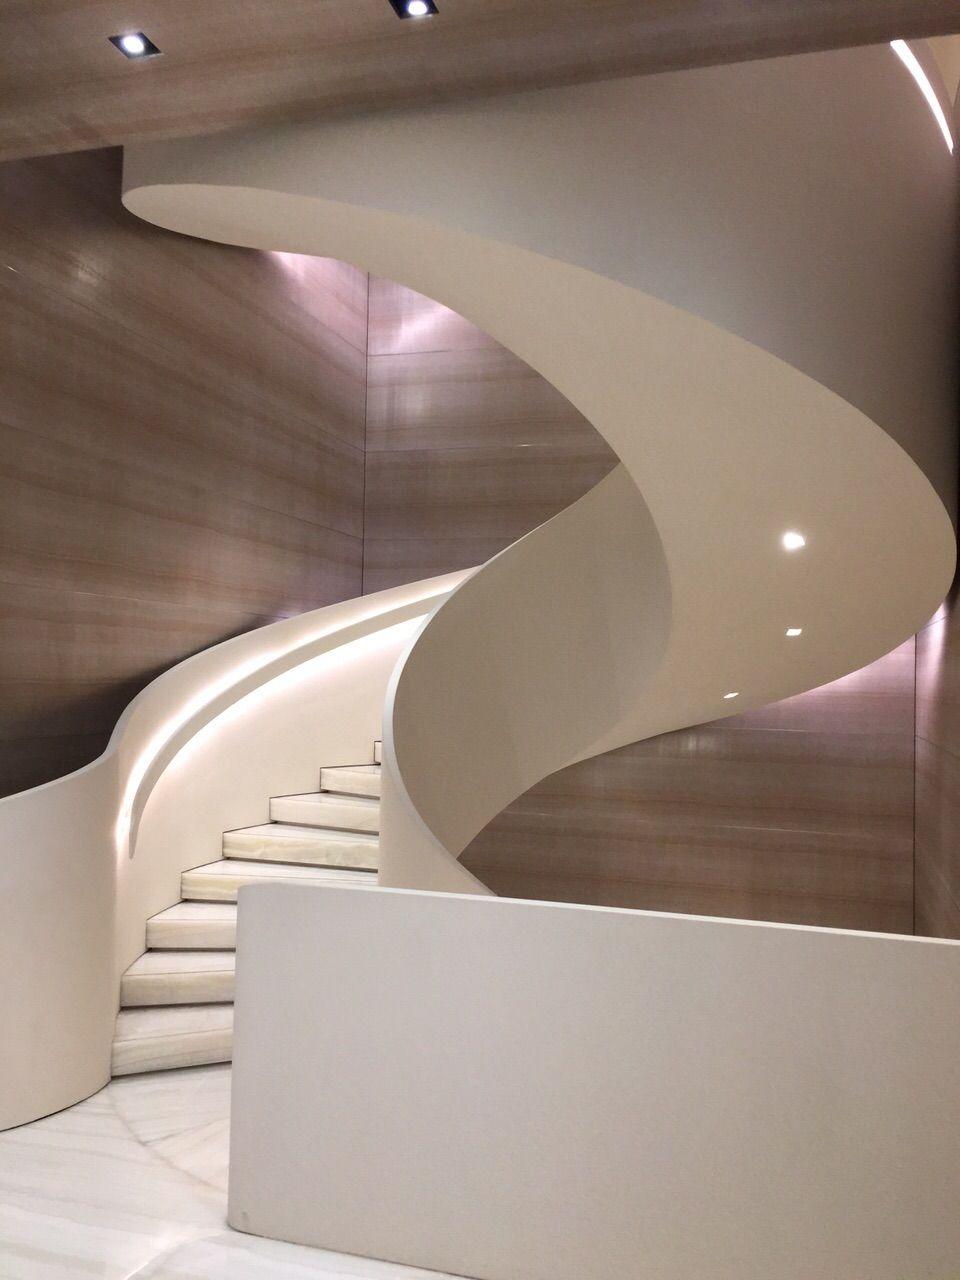 Best Pin De Megs En Ideas For The House Escaleras Escalera 400 x 300